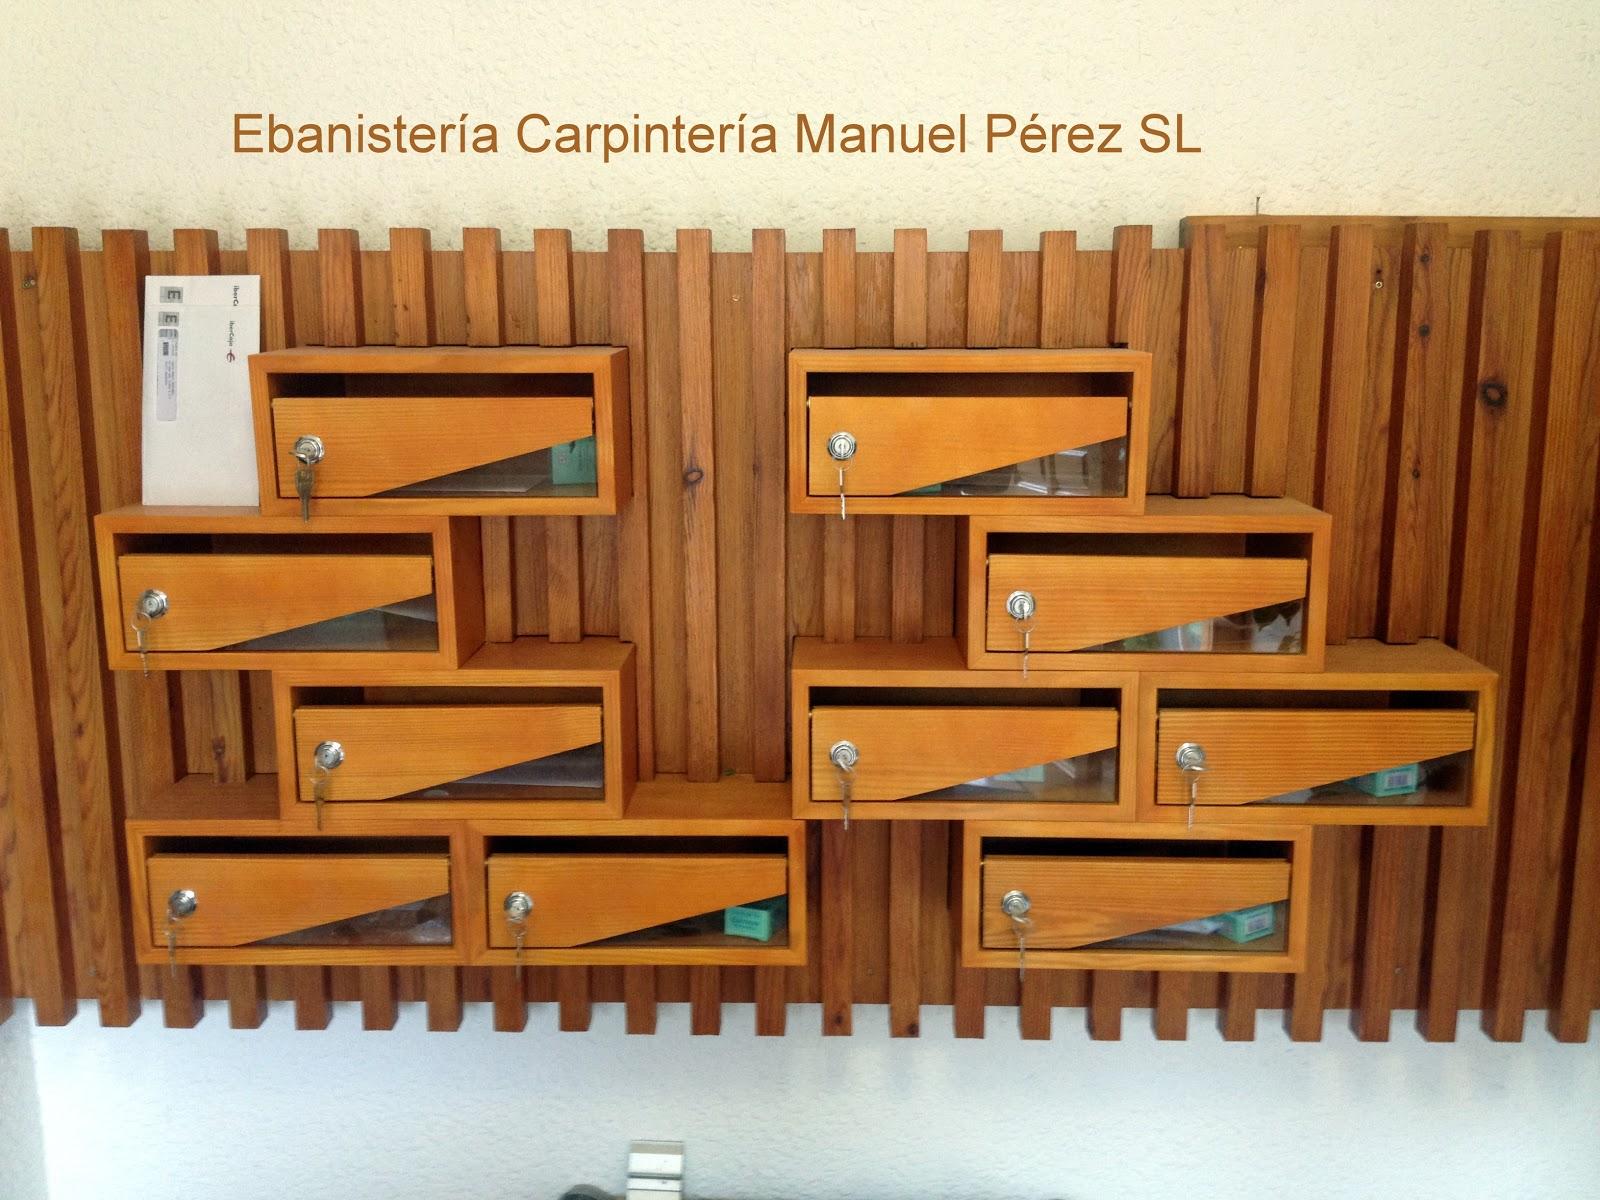 Ebanisteria carpinteria manuel perez zaragoza buzones for Carpinteria en madera